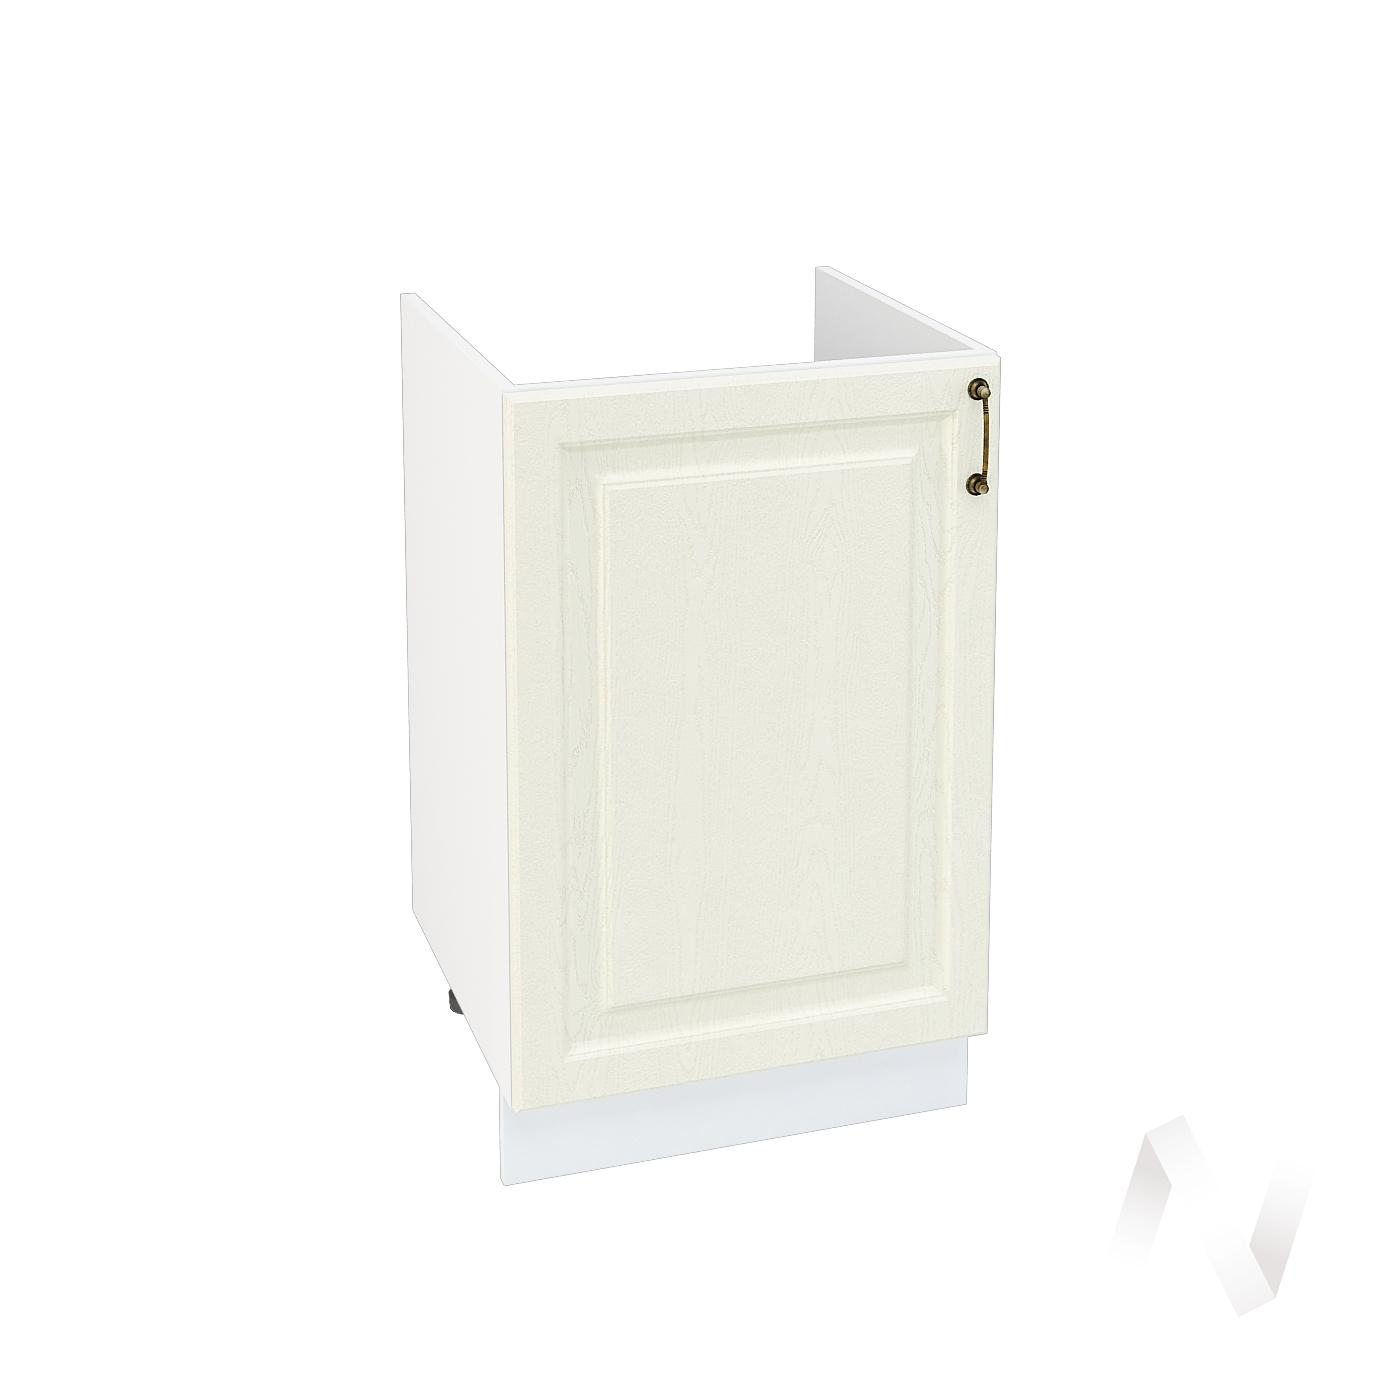 "Кухня ""Ницца"": Шкаф нижний под мойку 500, ШНМ 500 (Крем/корпус белый)"